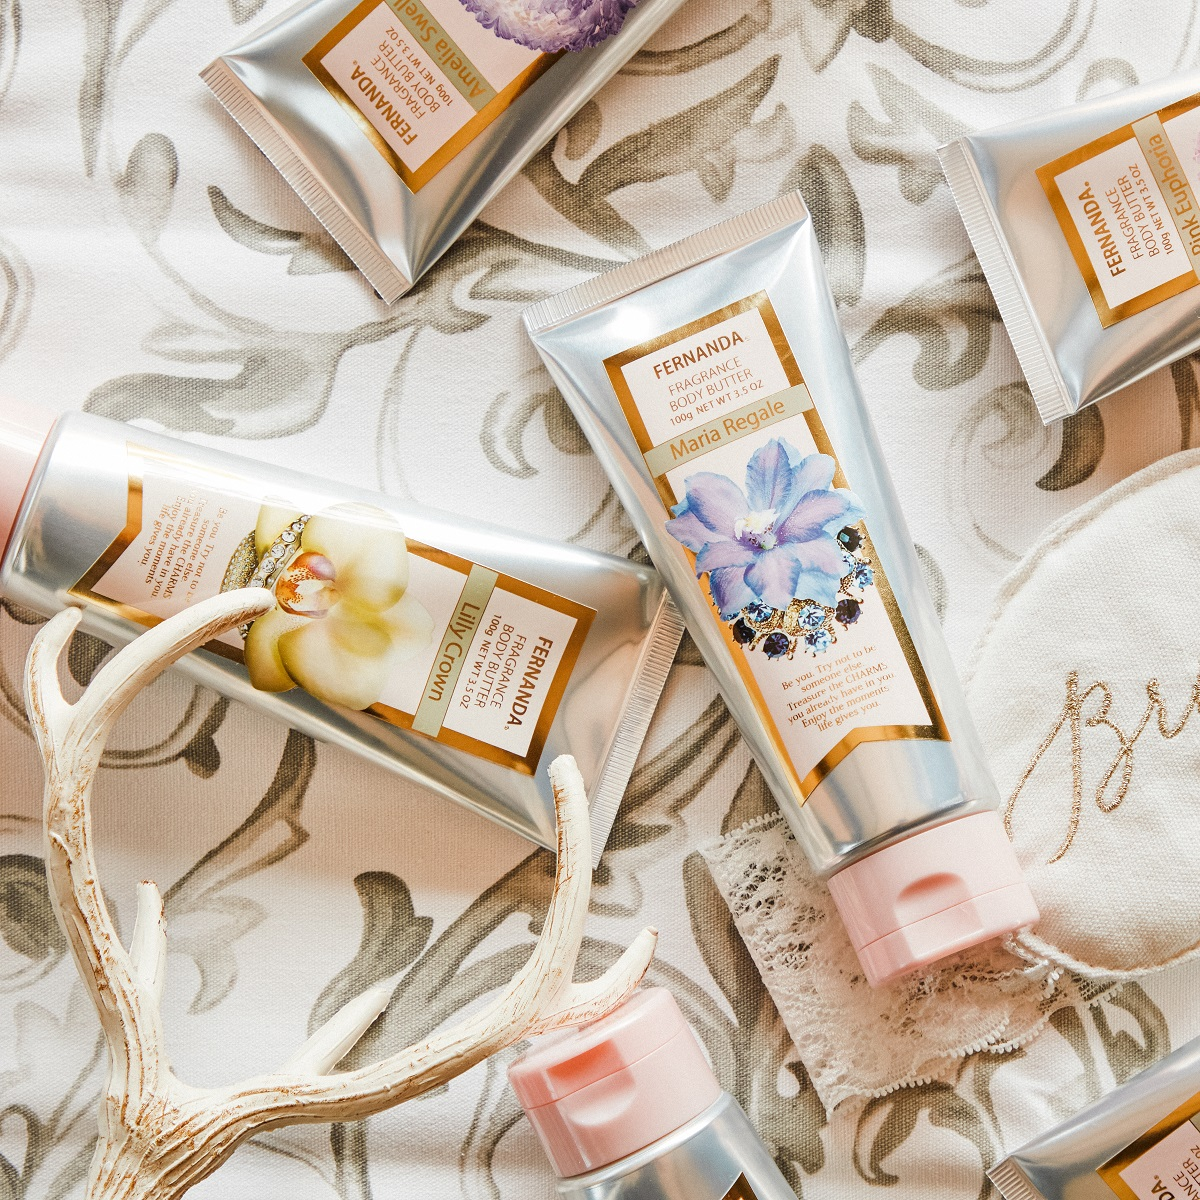 Fragrance Body Butter(Maria Regale)/フレグランスボディバター(マリアリゲル)